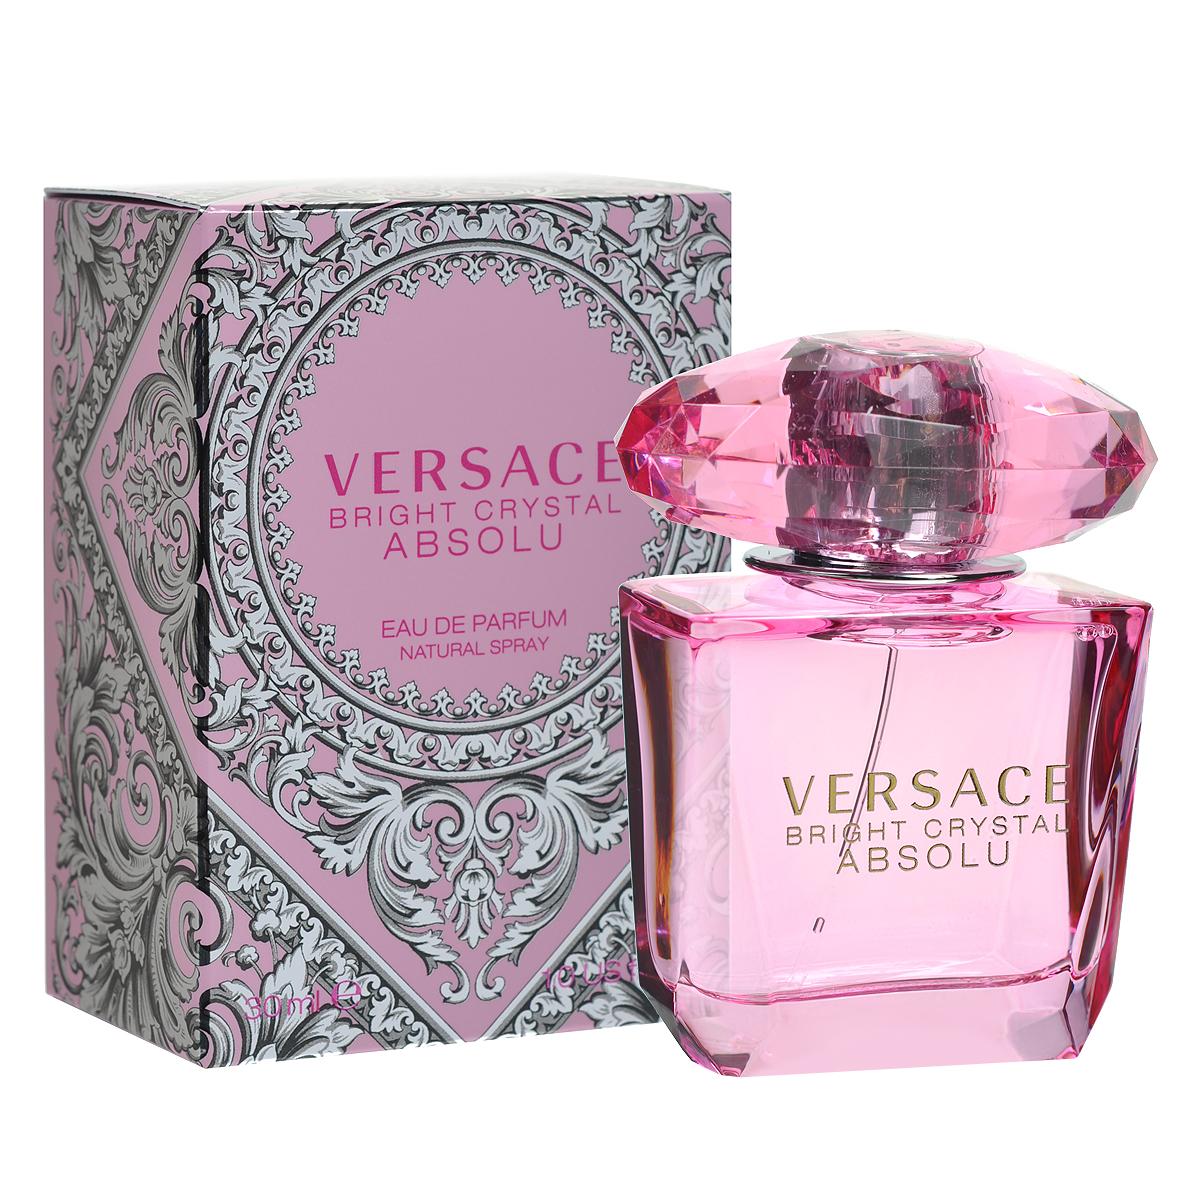 Versace Парфюмерная вода Bright Crystal Absolu, женская, 30 мл парфюмерная вода versace bright crystal absolu 50 мл